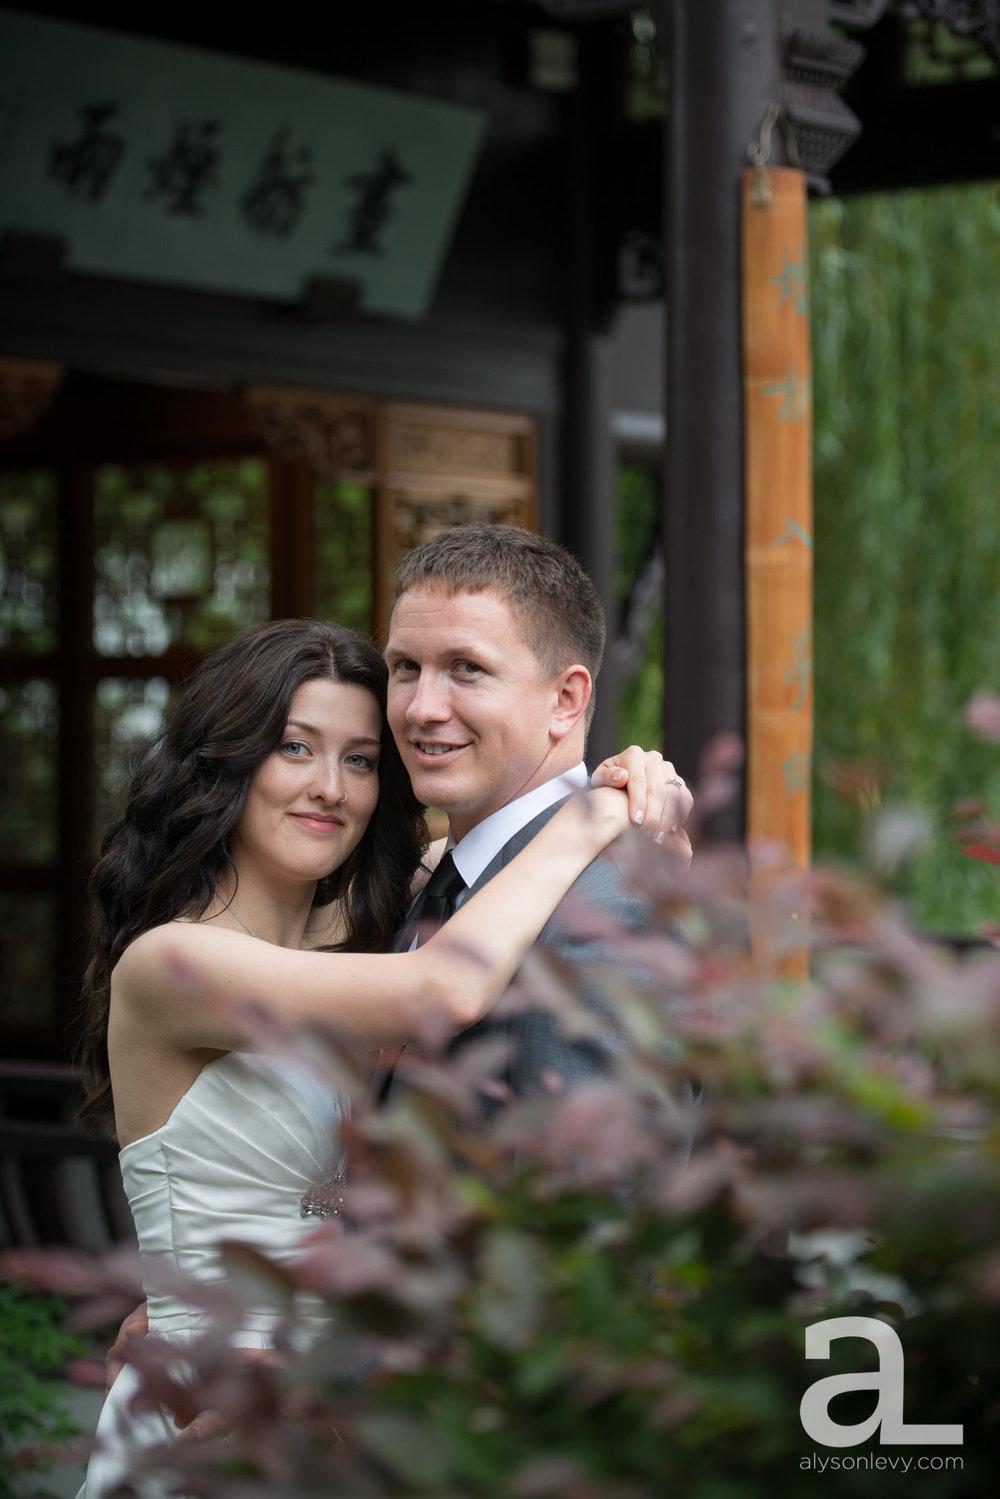 LanSu-Chinese-Garden-Portland-Wedding-Photography-004.jpg